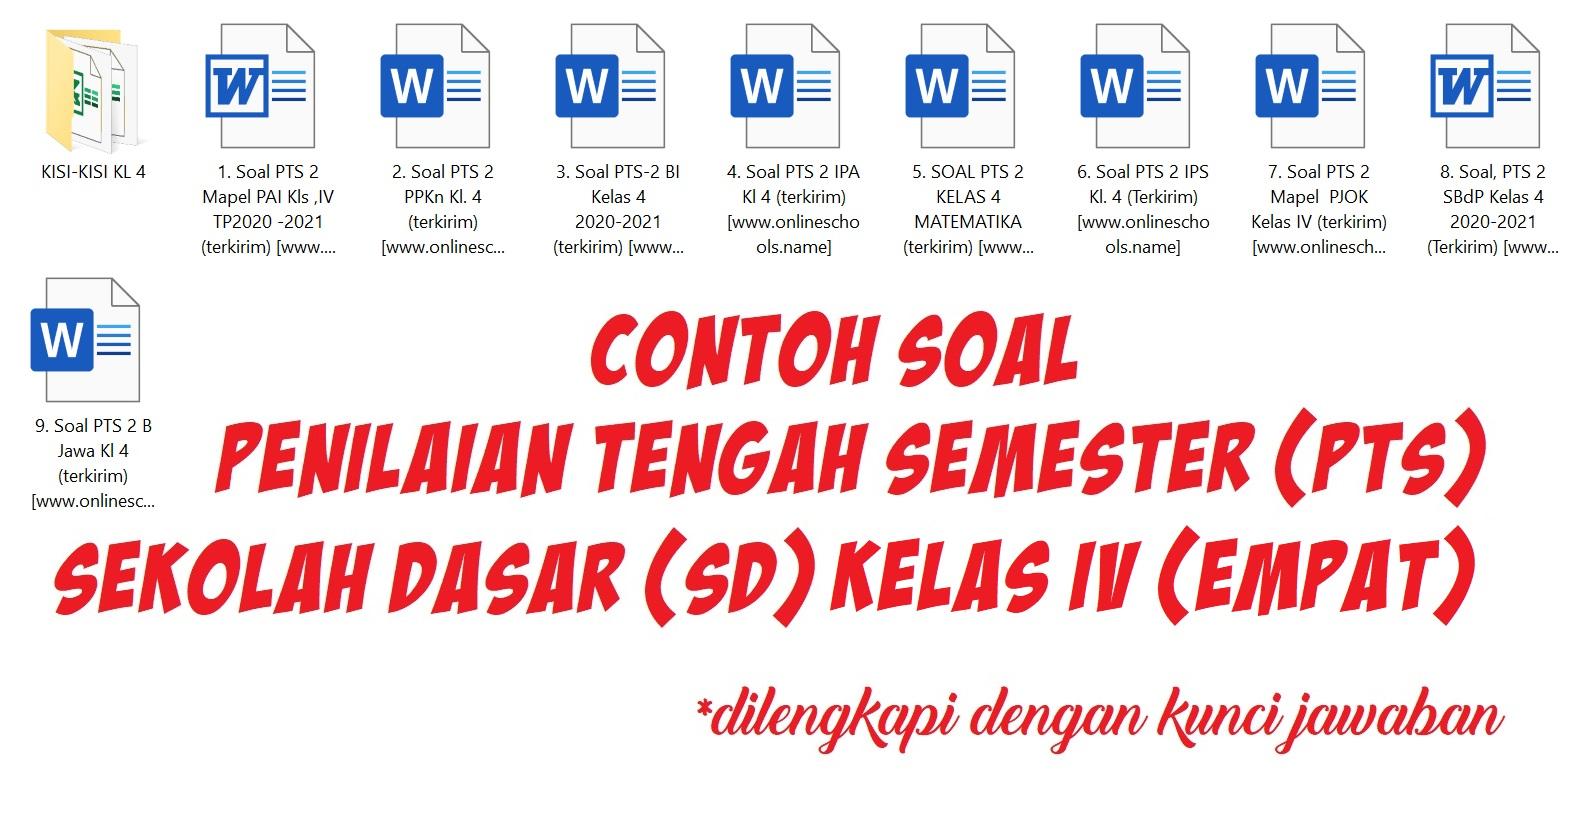 Contoh Soal Penilaian Tengah Semester (PTS) Sekolah Dasar (SD) Kelas IV (Empat)